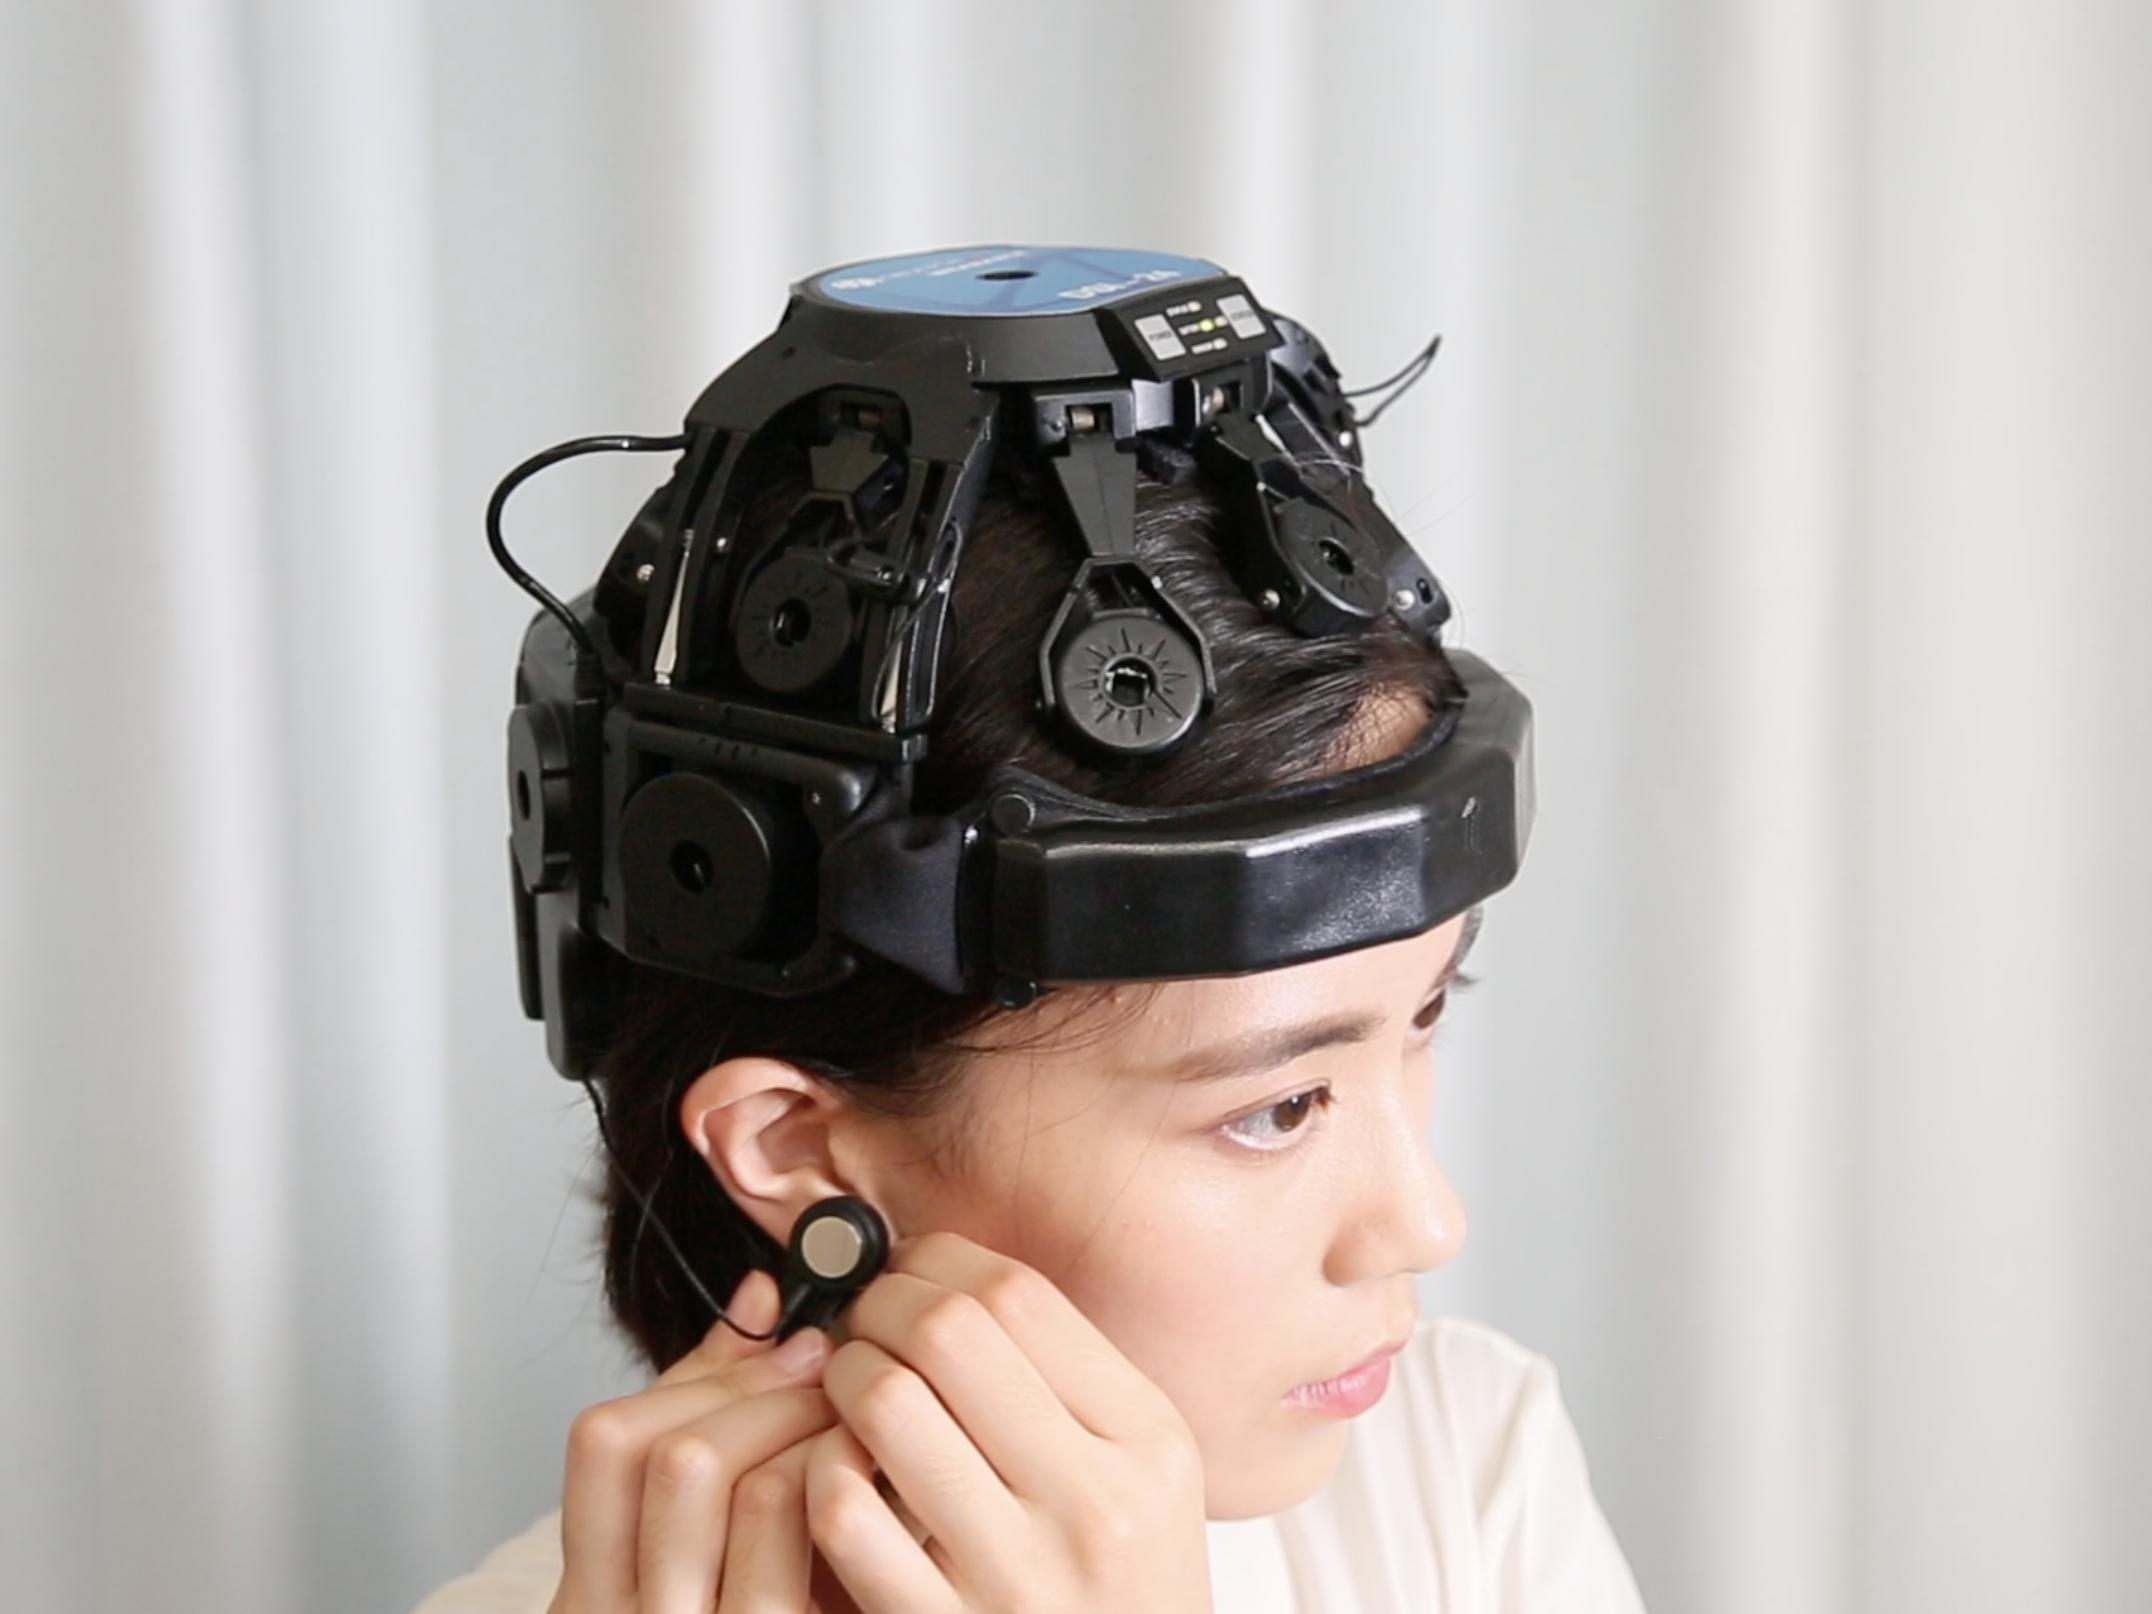 EEG-based brain-computer interface. Technology by Neuracle.